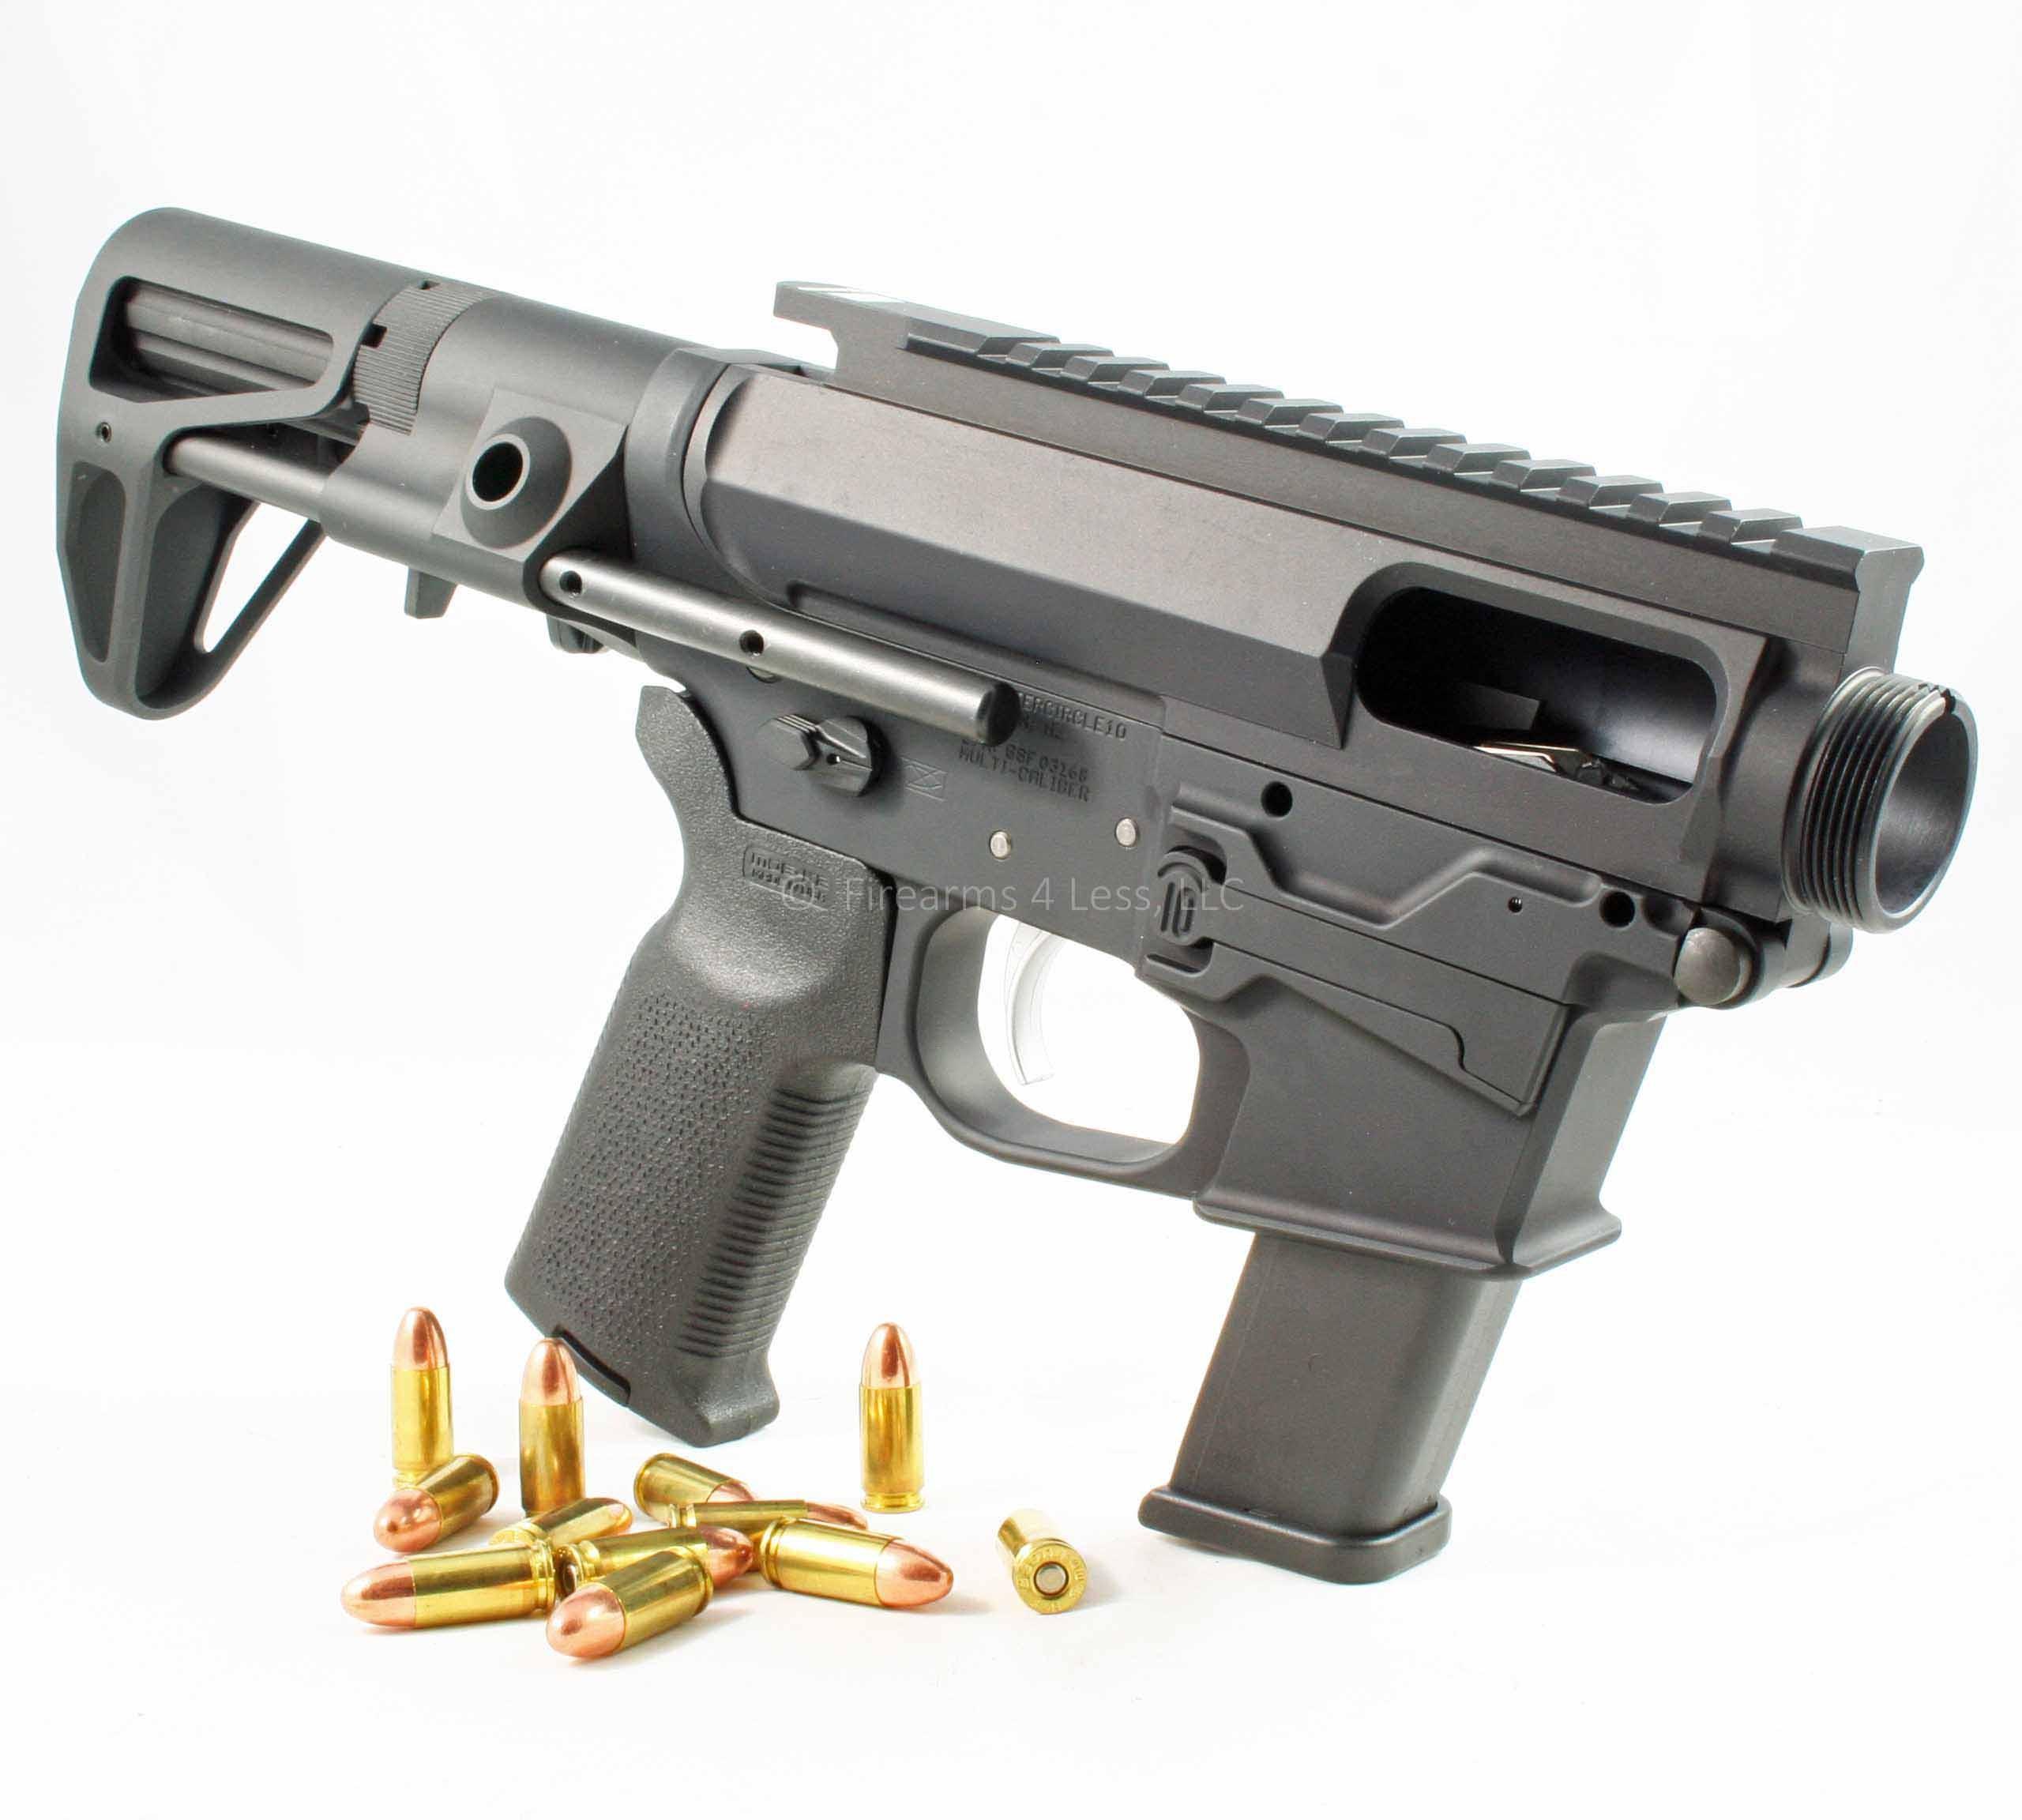 Quarter Circle 10 GSF 9mm Complete AR15 Lower/Upper w/ Maxim